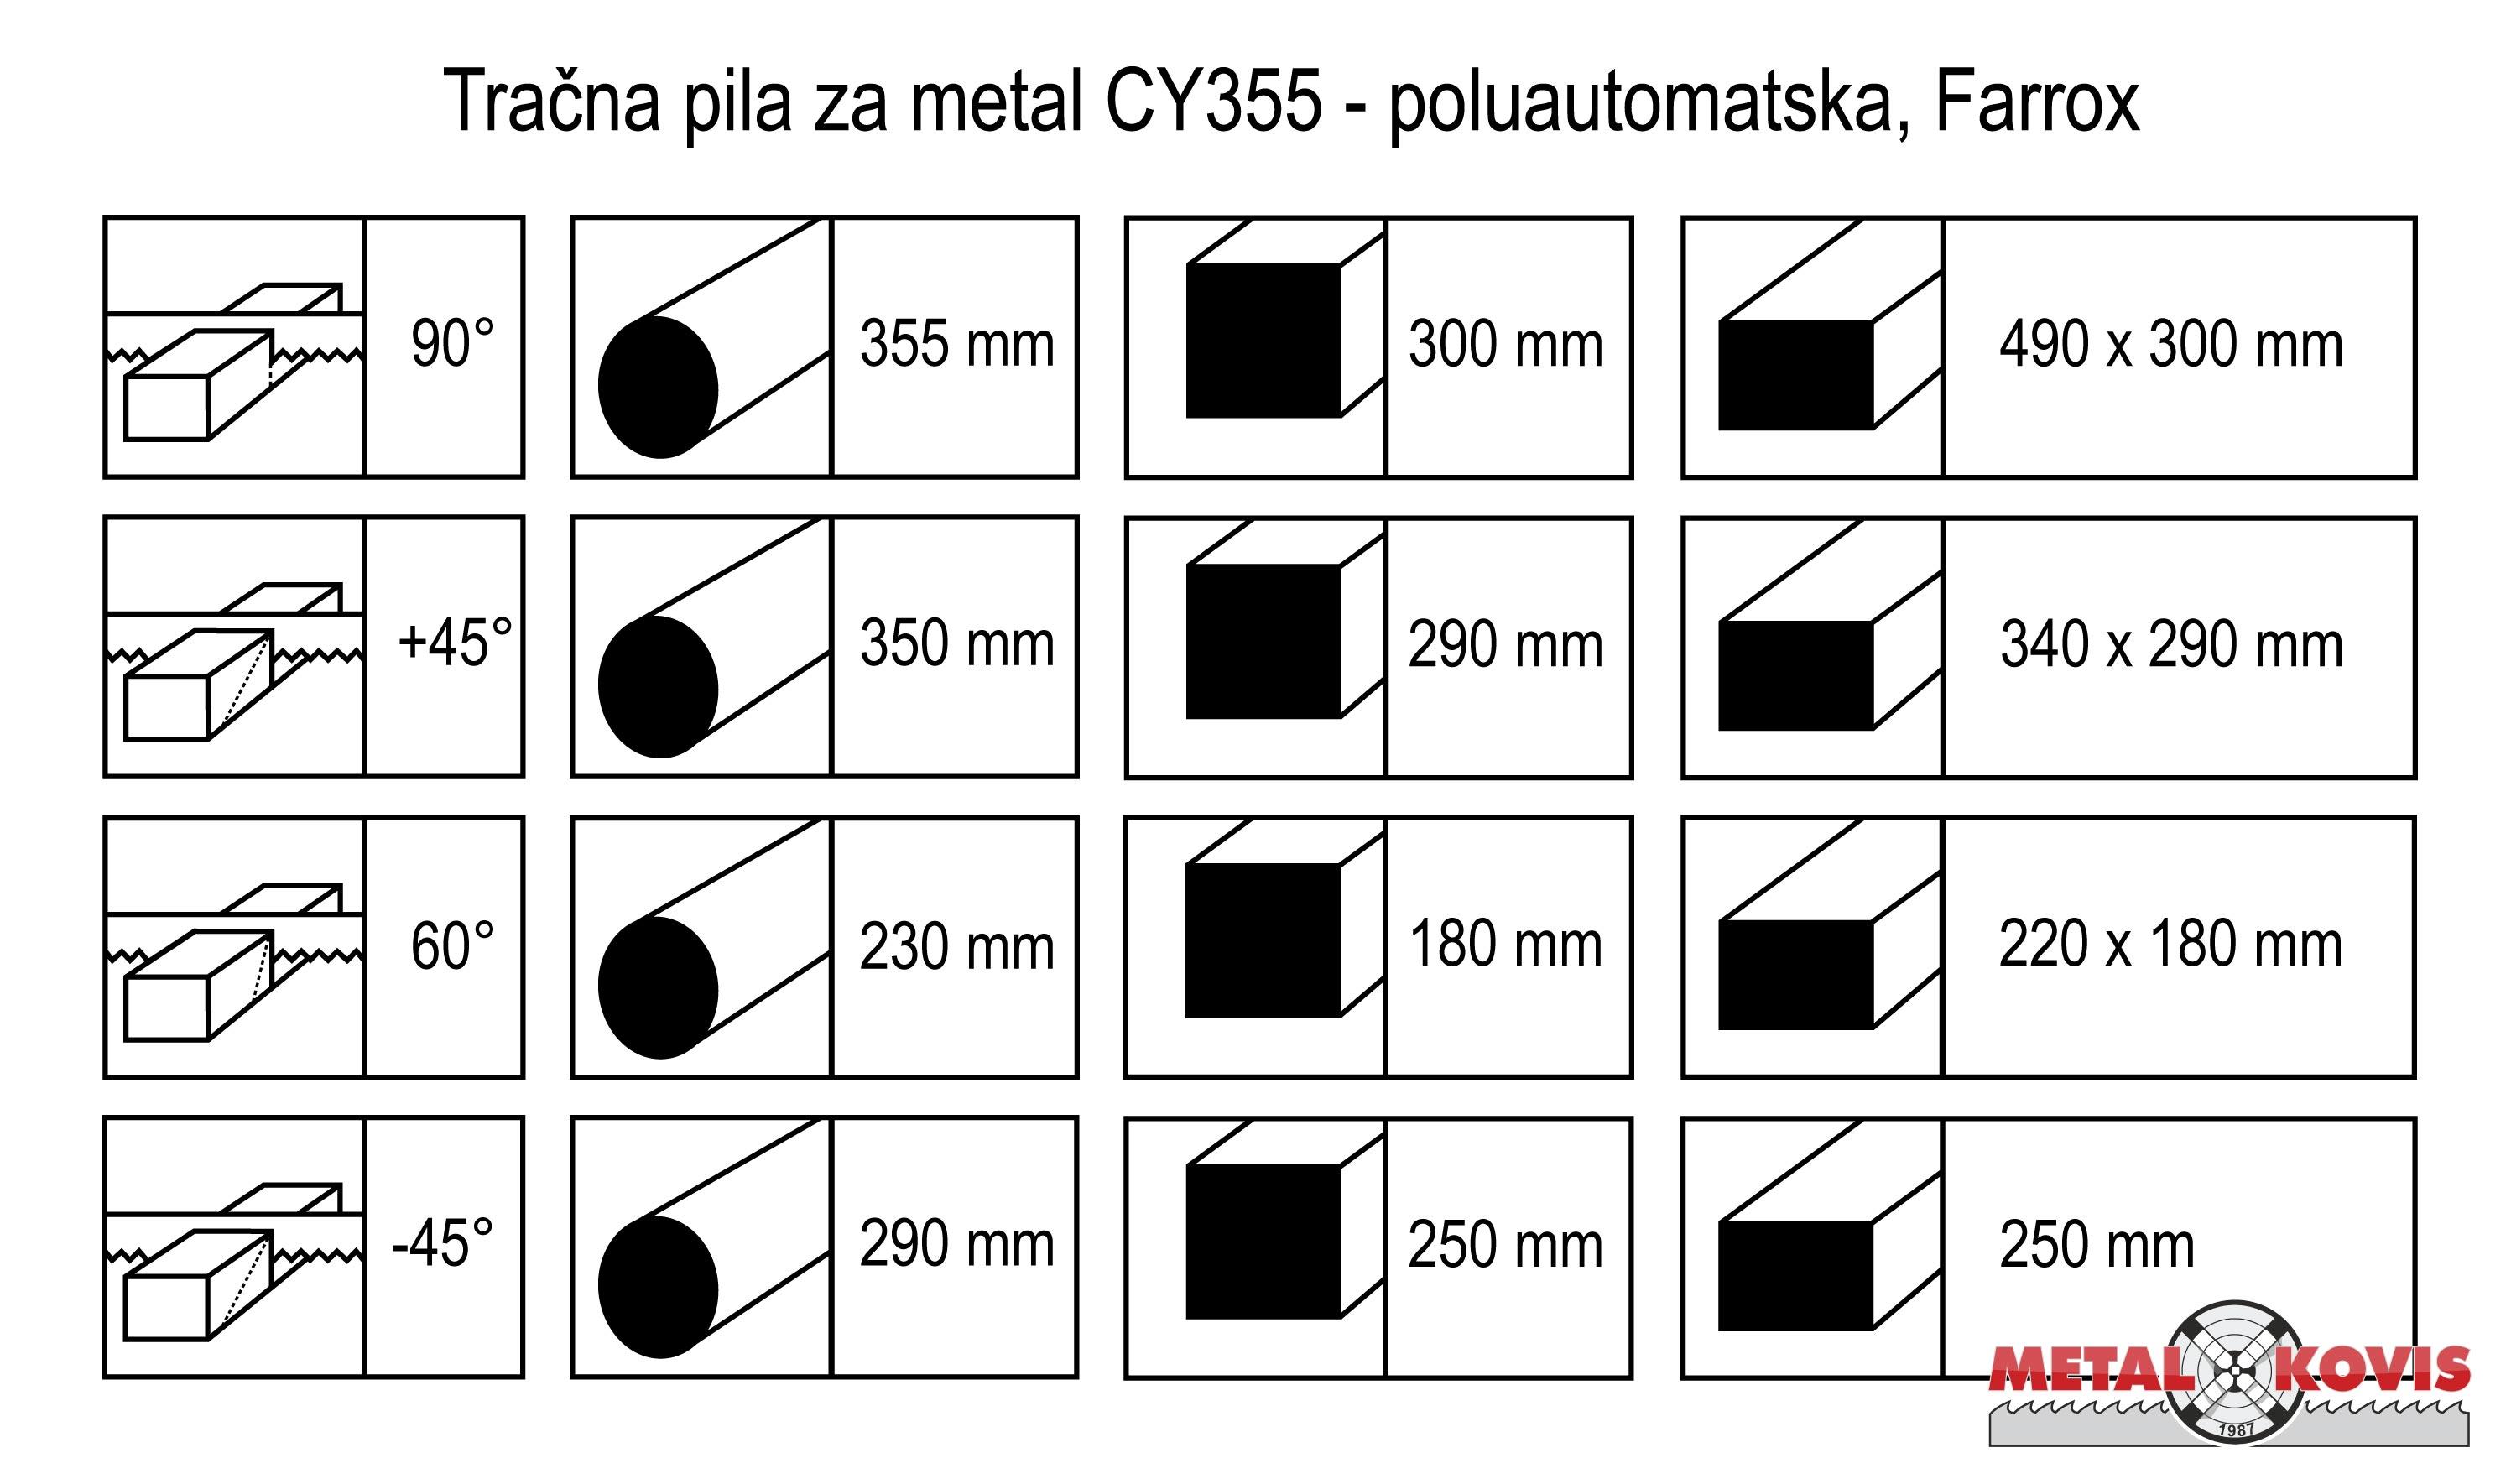 Tračna pila za metal CY355 - poluautomatska, Farrox